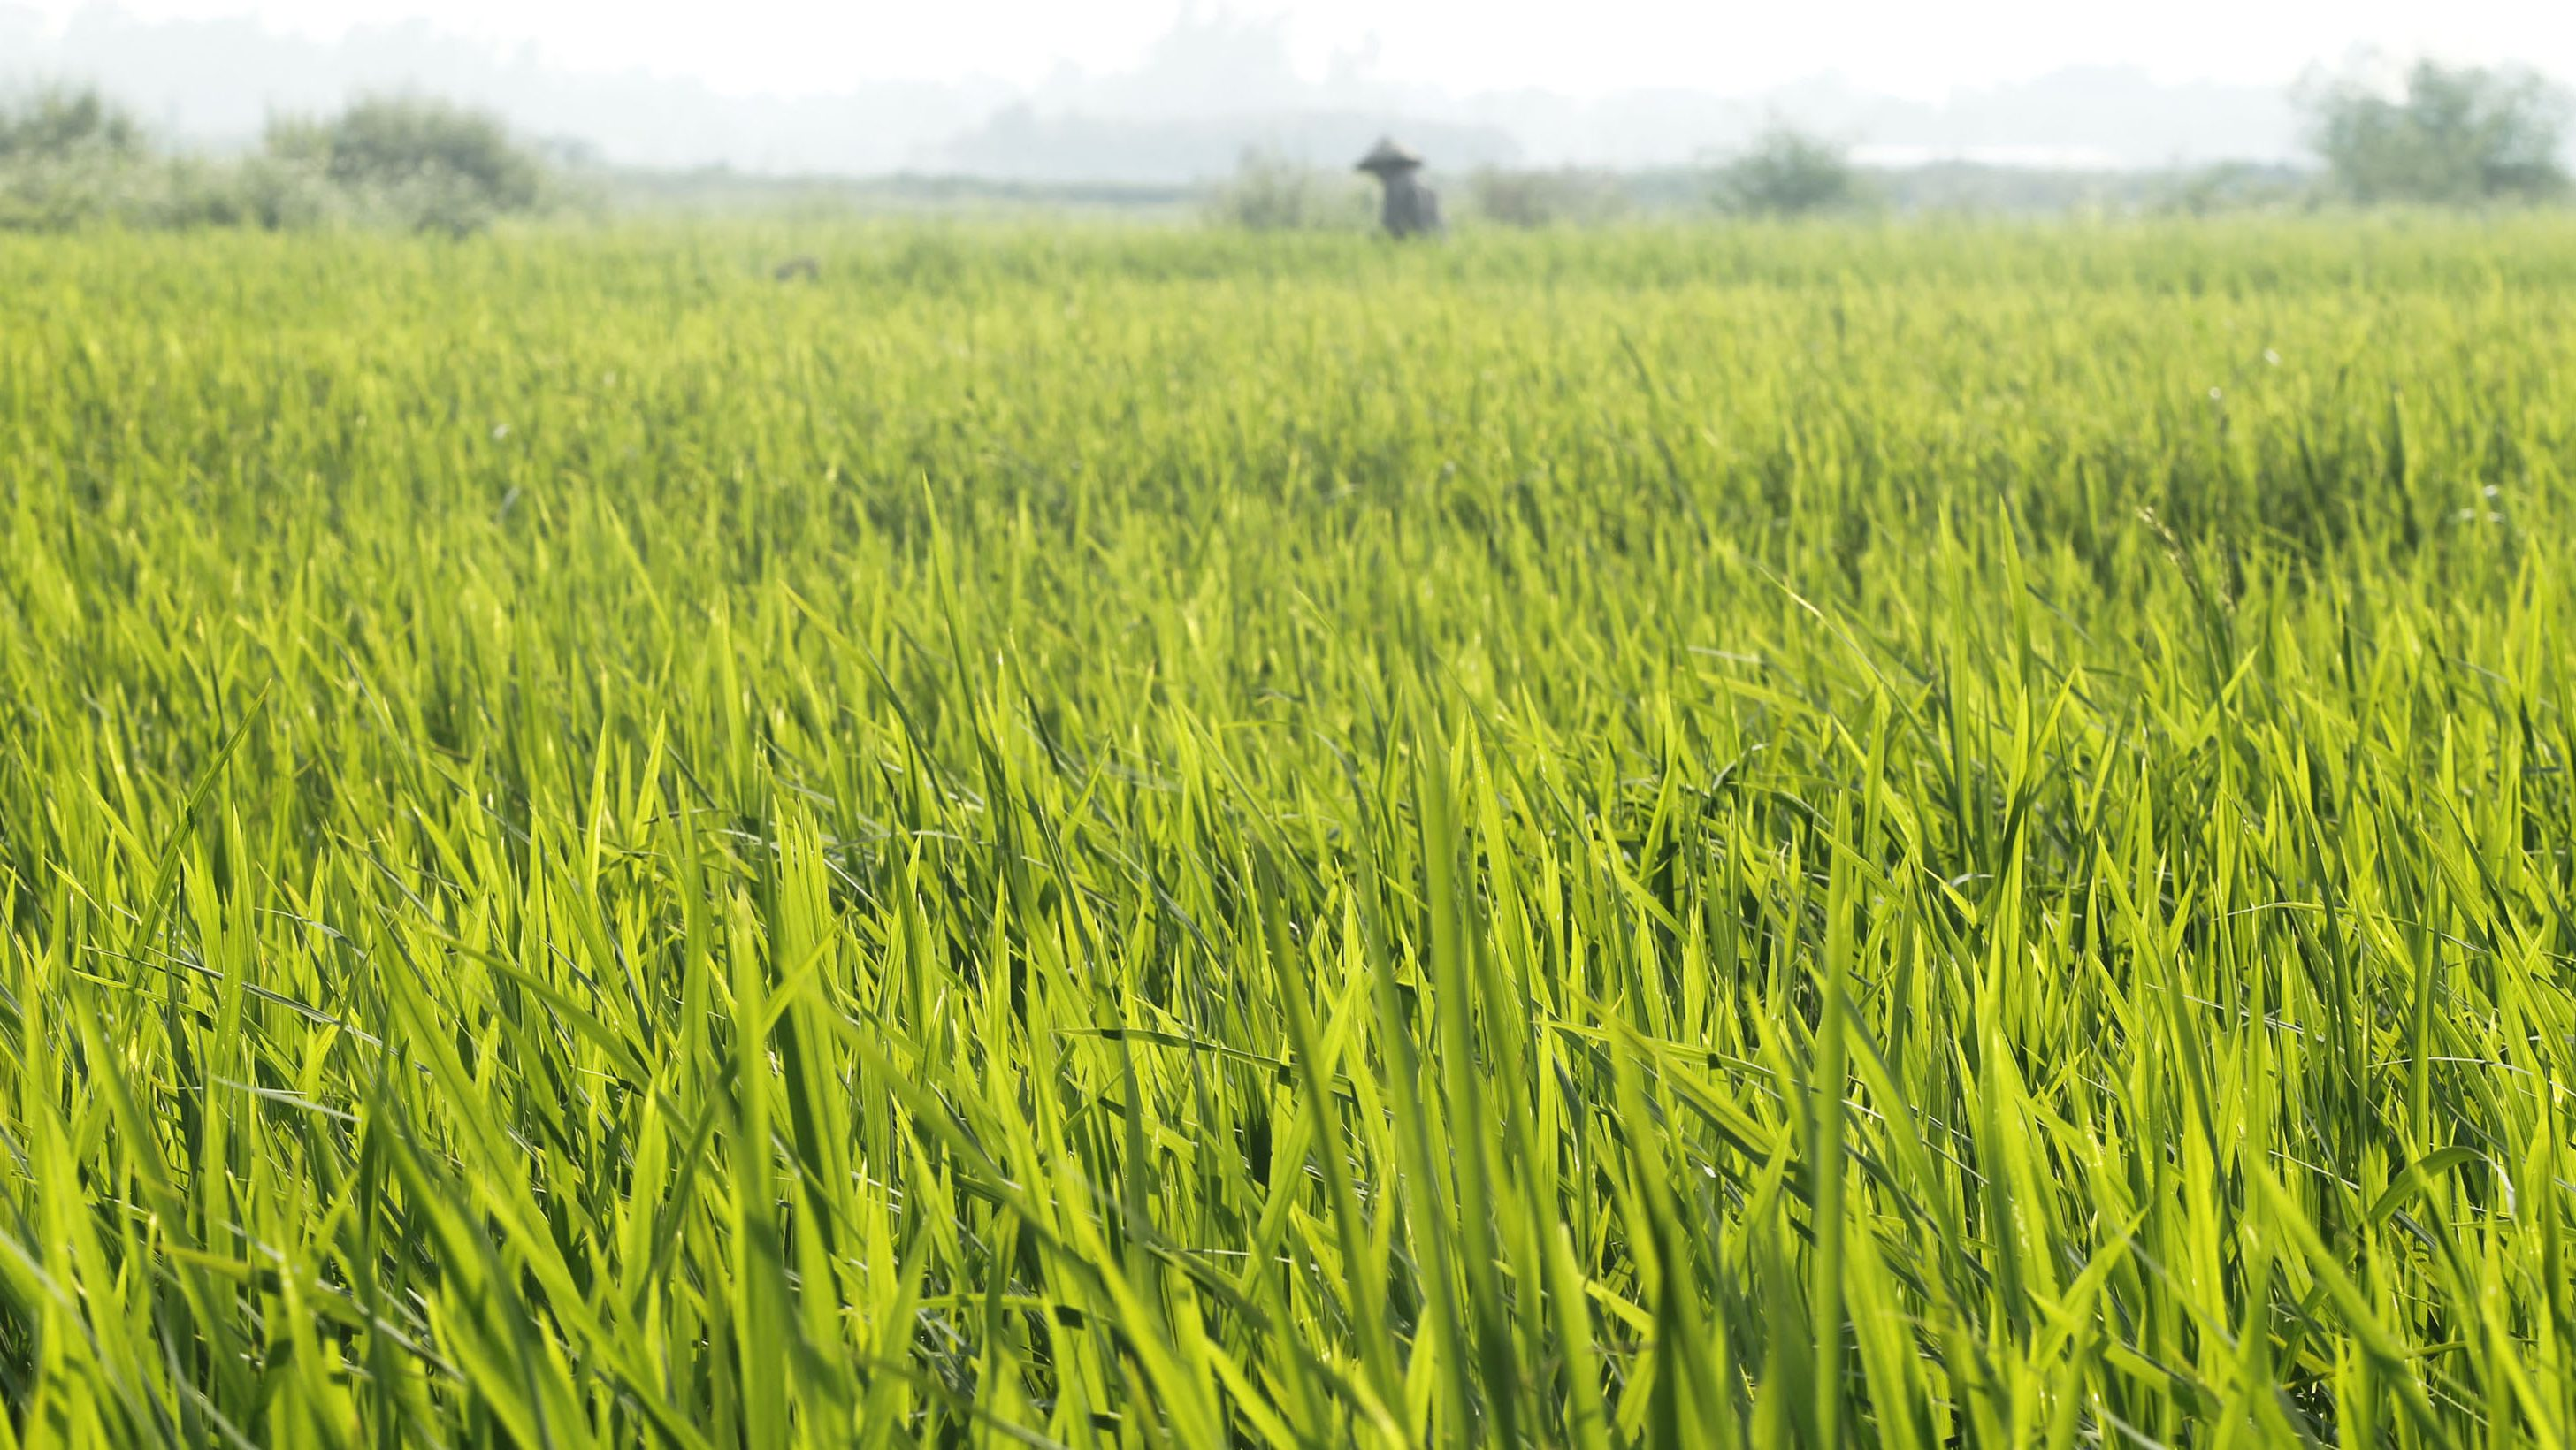 A farmer works on a rice paddy field outside Hanoi September 28, 2011.